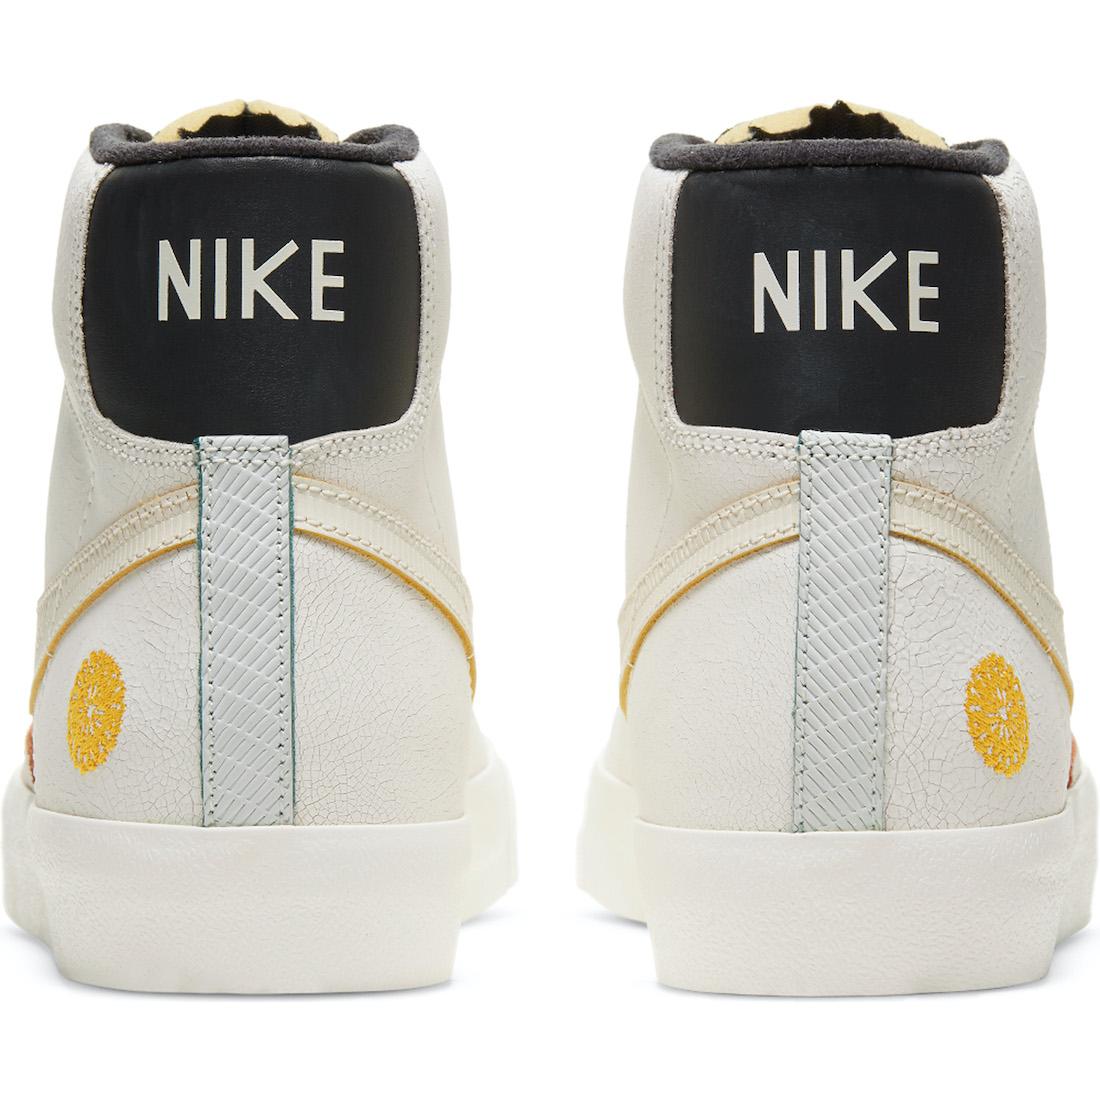 Nike Blazer Mid Day of the Dead Release Date Info